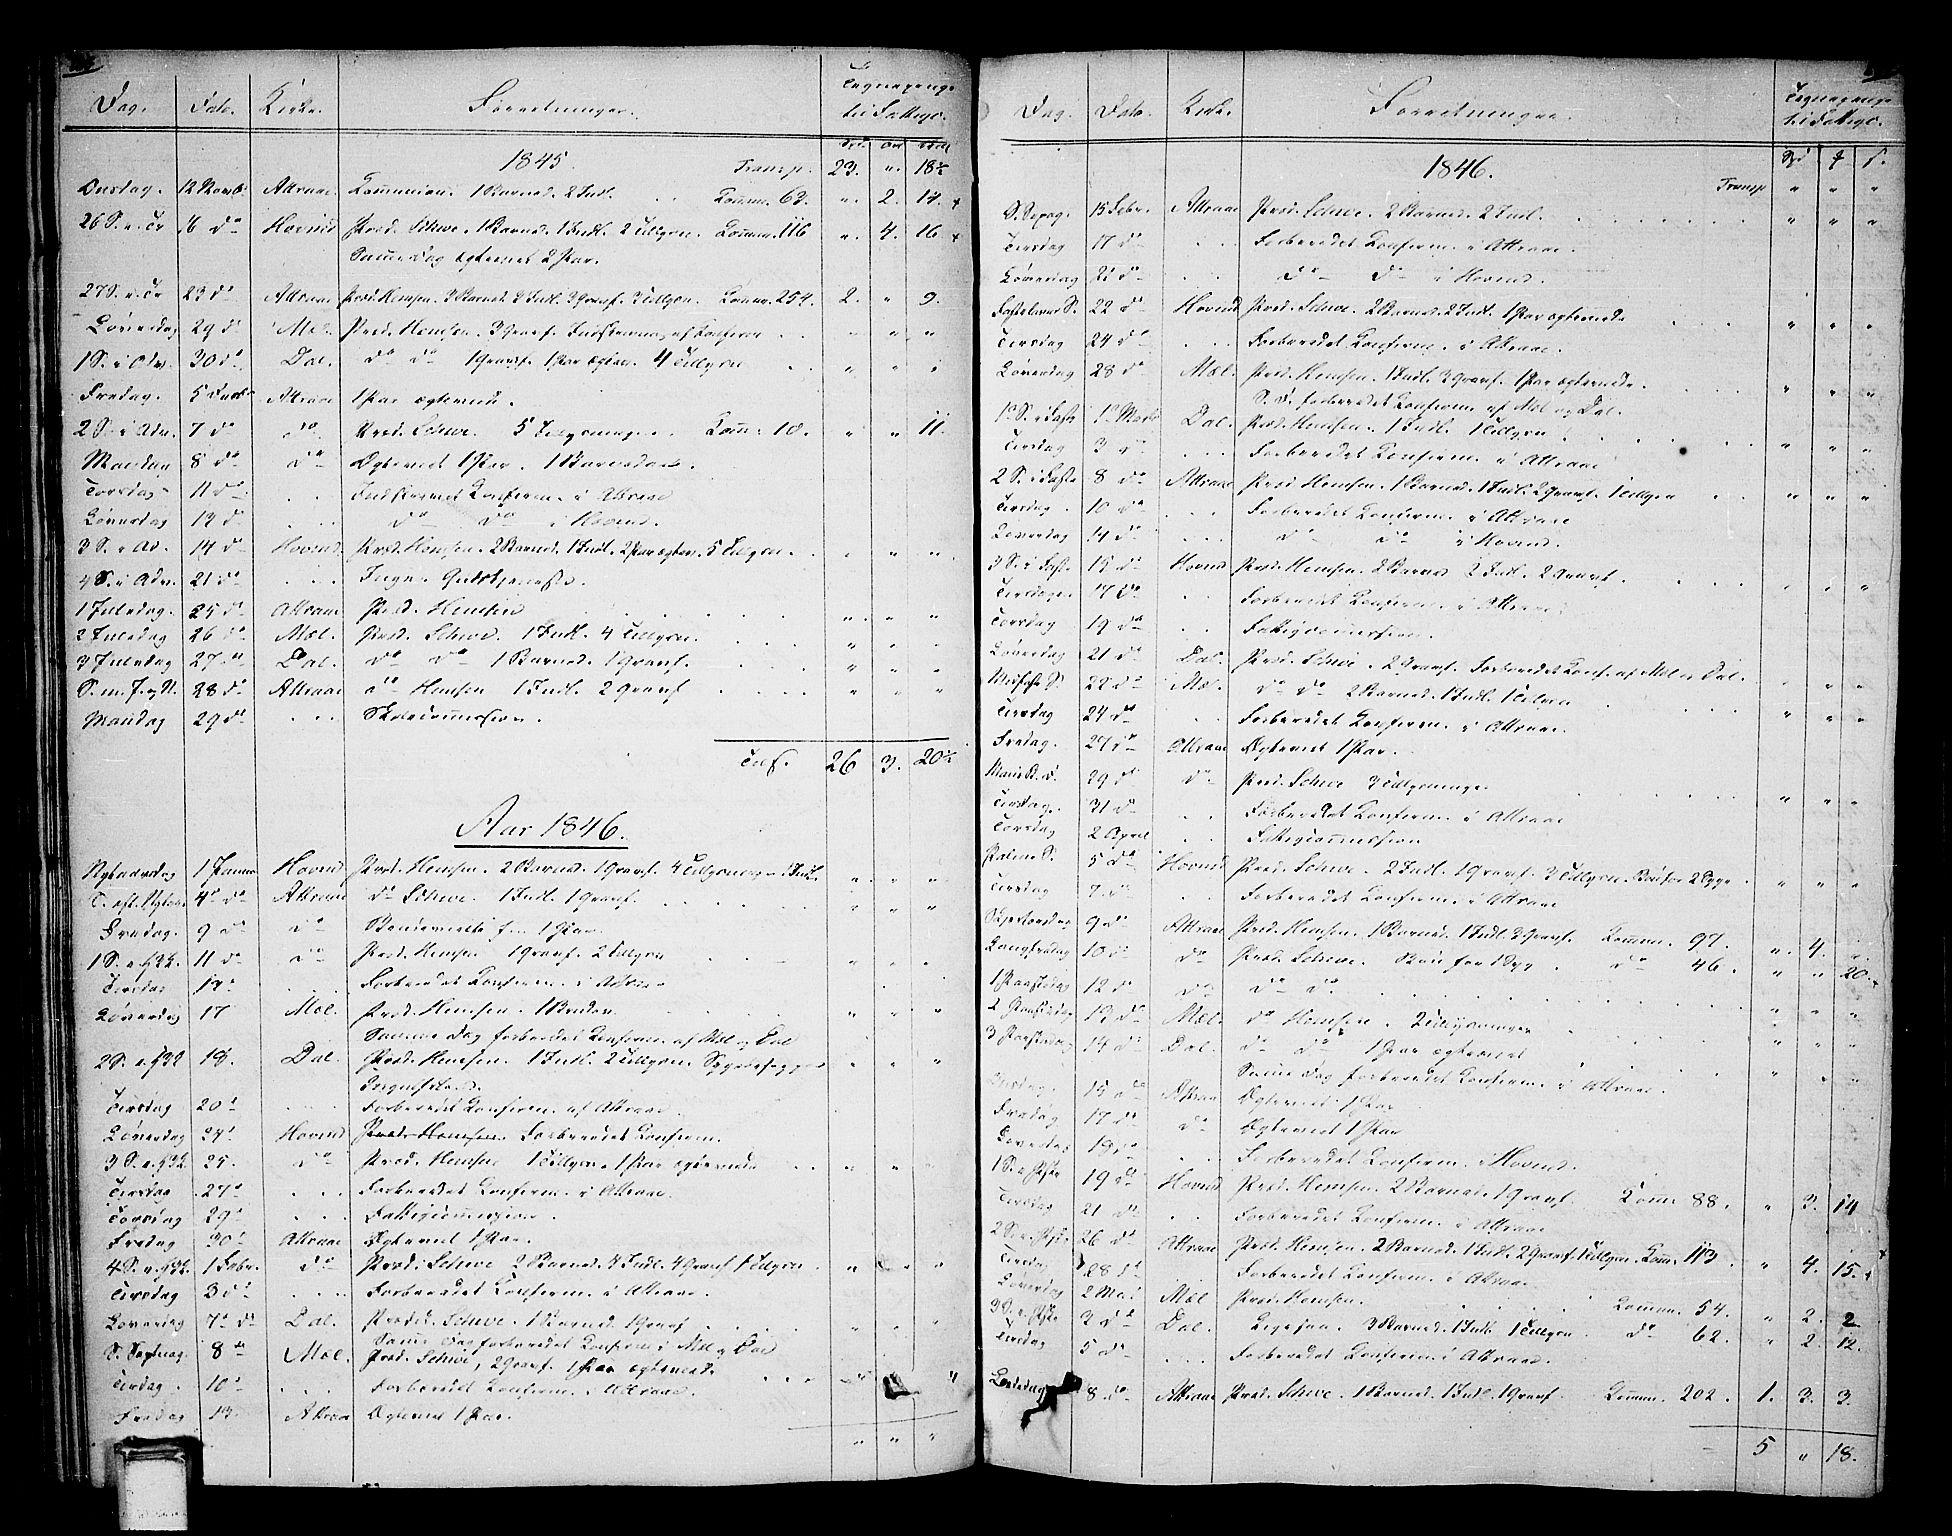 SAKO, Tinn kirkebøker, F/Fa/L0003: Ministerialbok nr. I 3, 1810-1814, s. 186-187